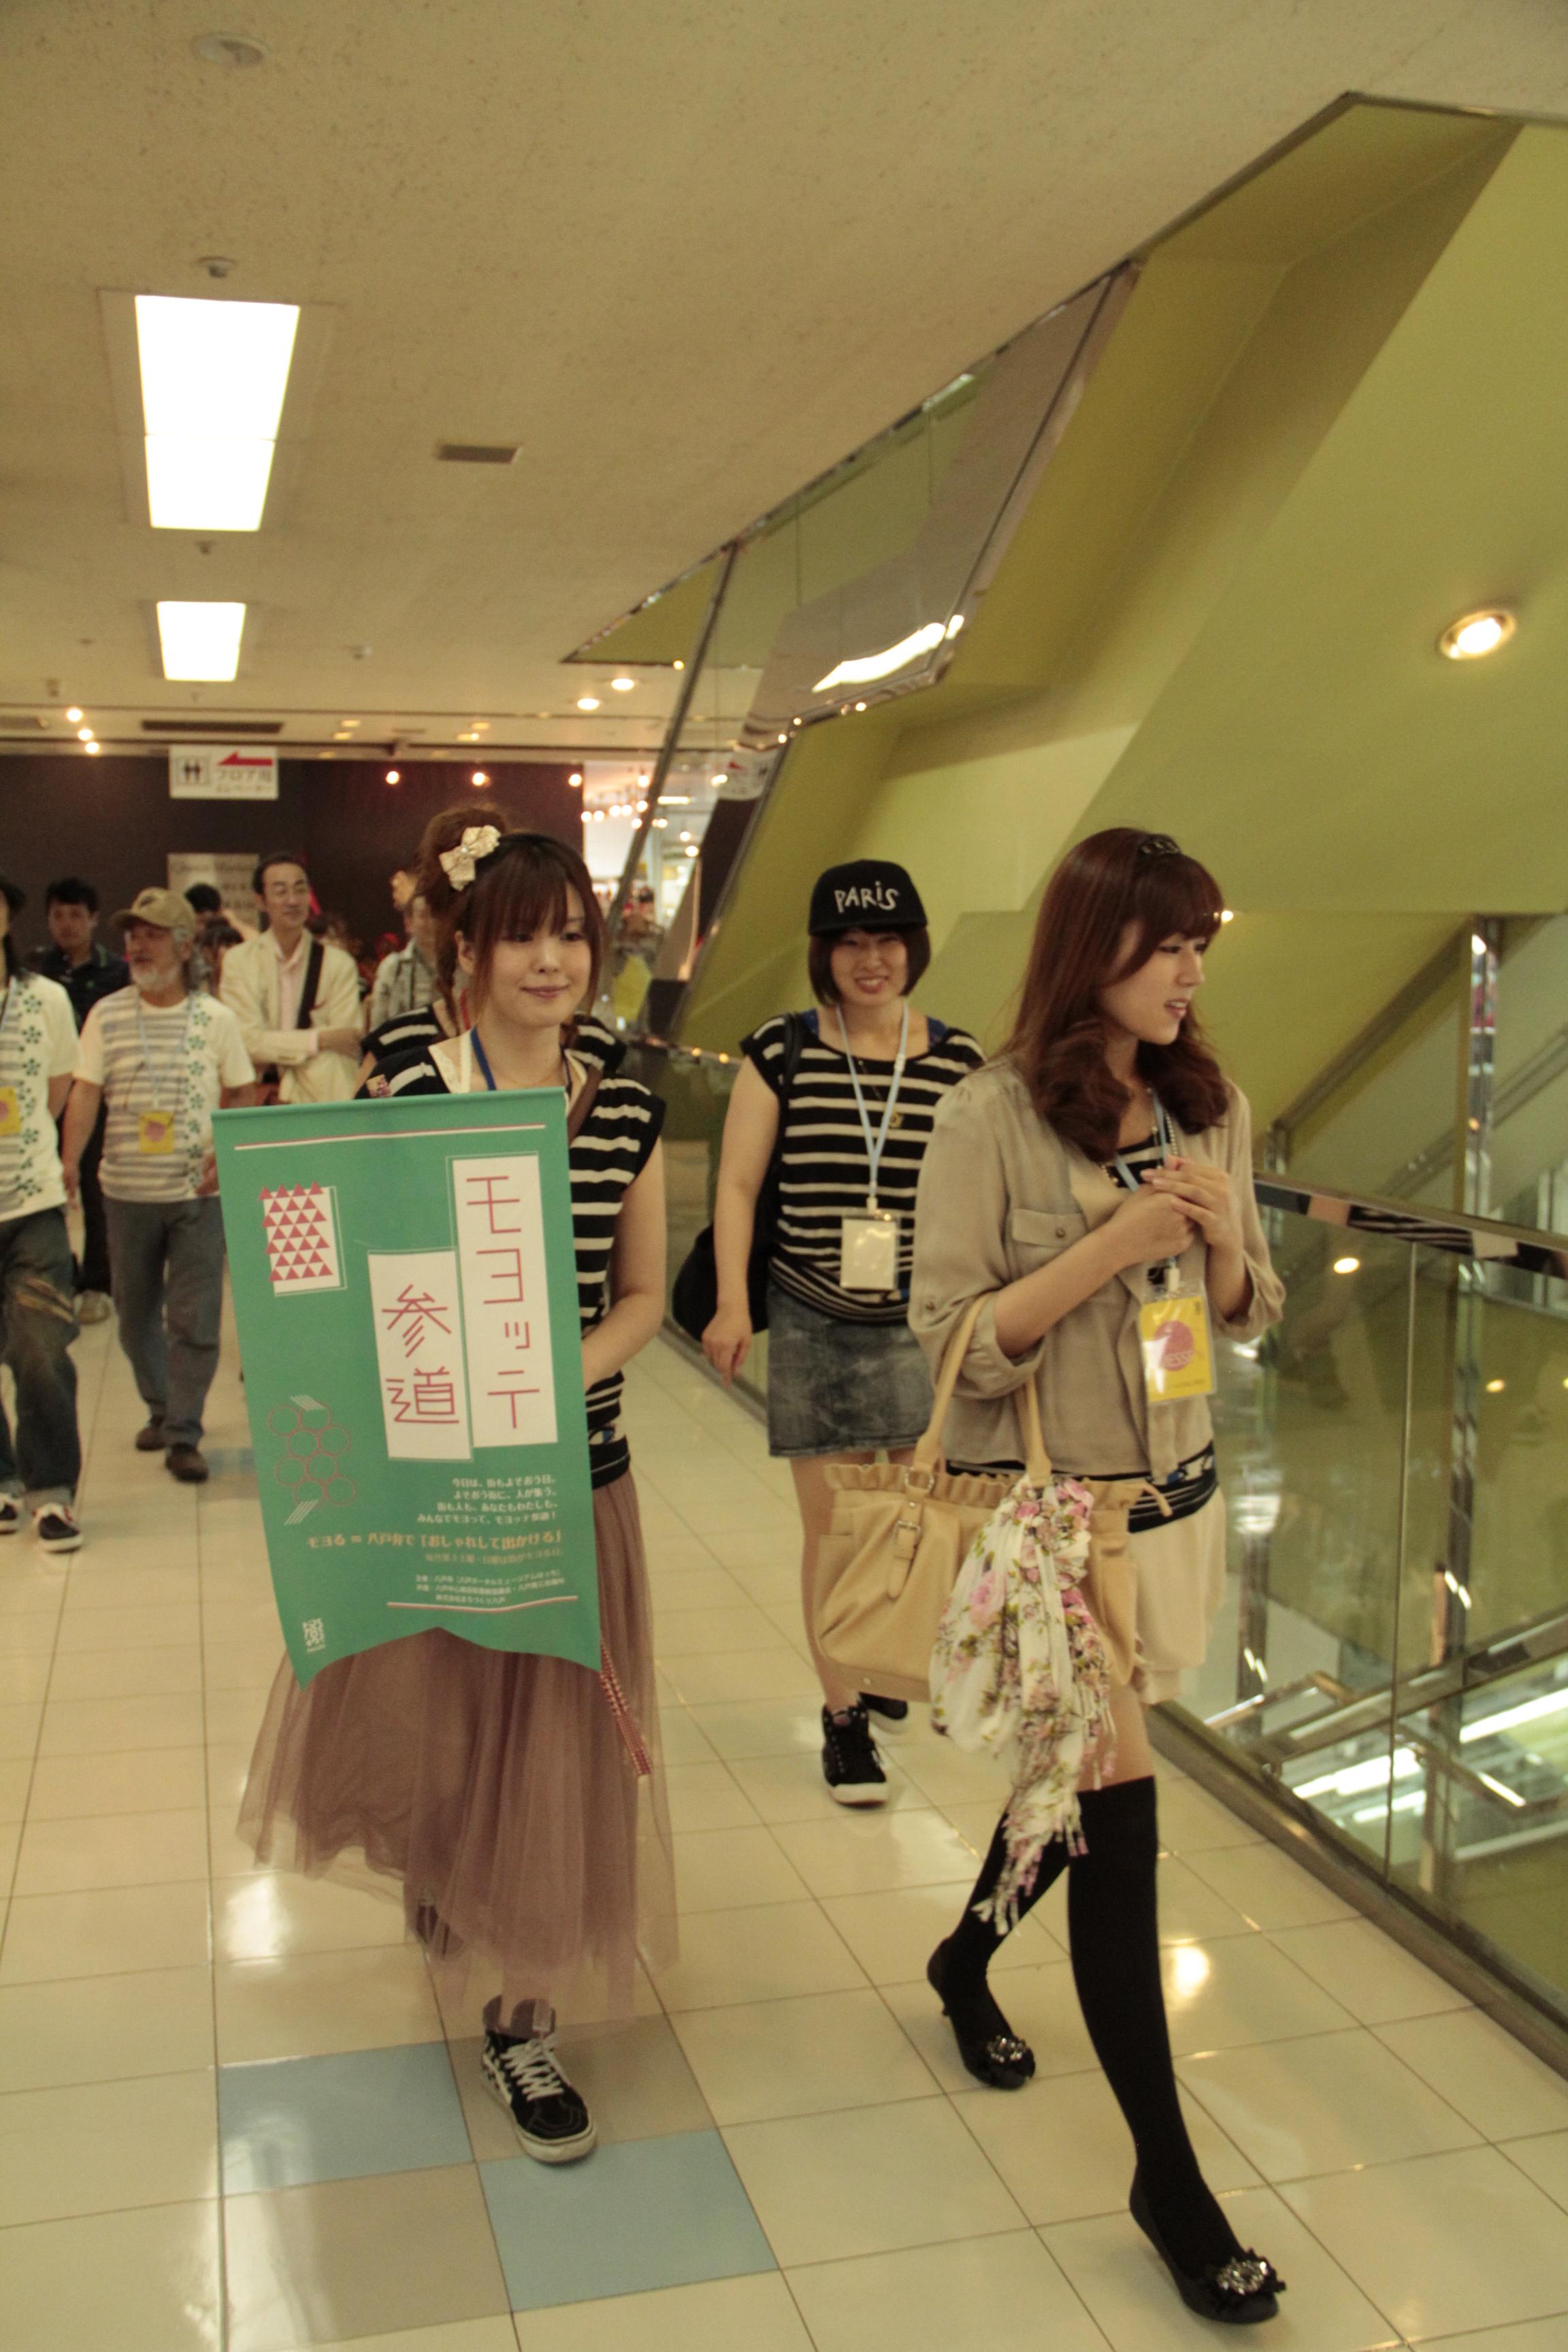 http://hacchi.jp/blog/upload/images/%E7%94%BB%E5%83%8F4.JPG